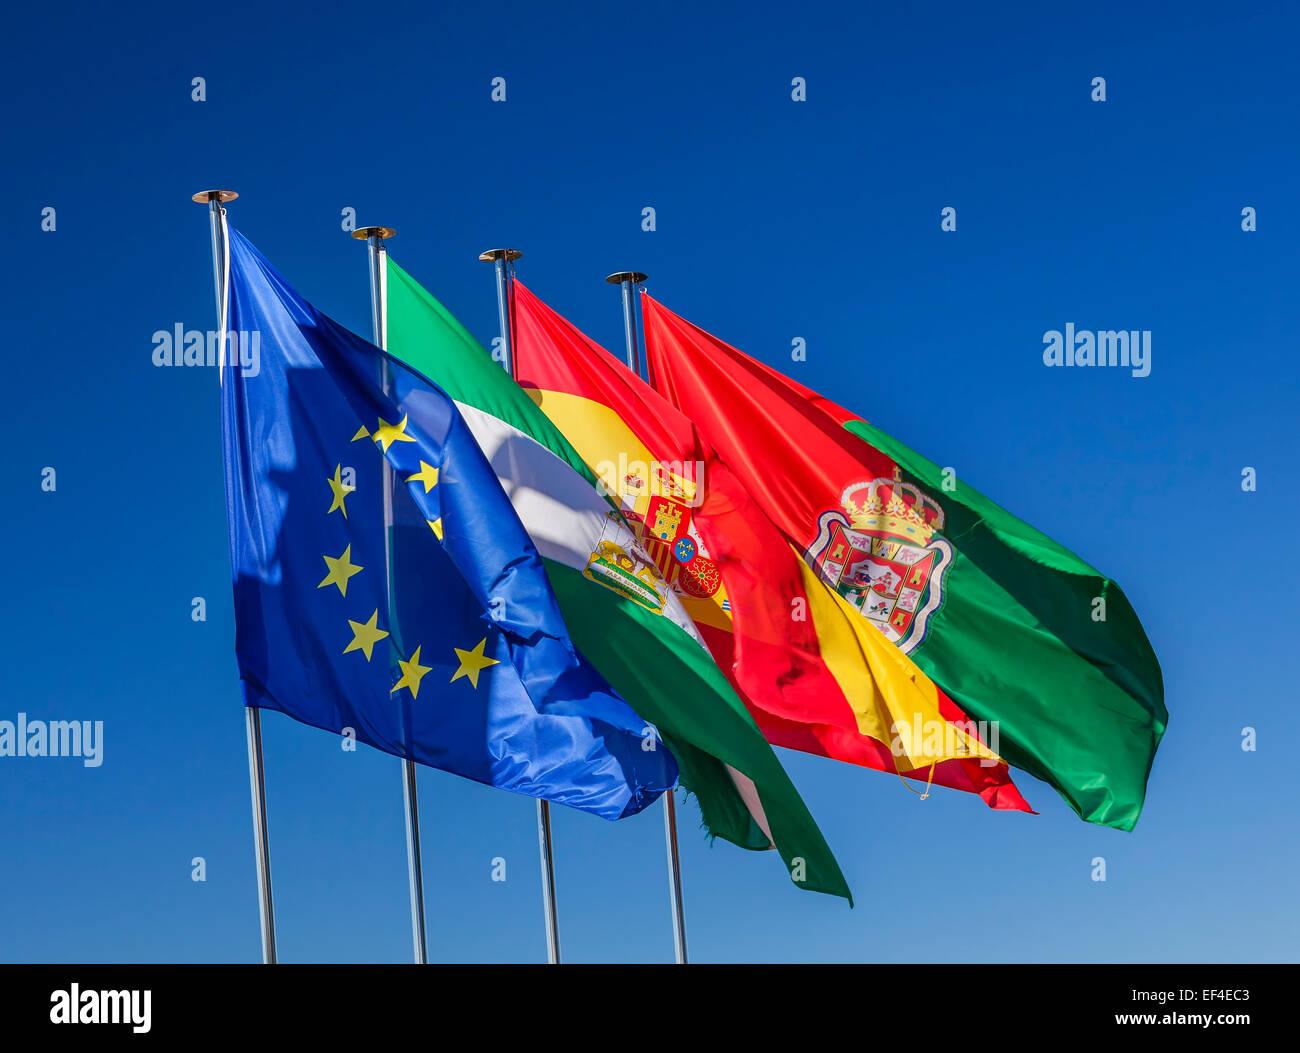 Spain EC Portugal Andalusia Flags Symbols Granada Andalusia Spain - Stock Image